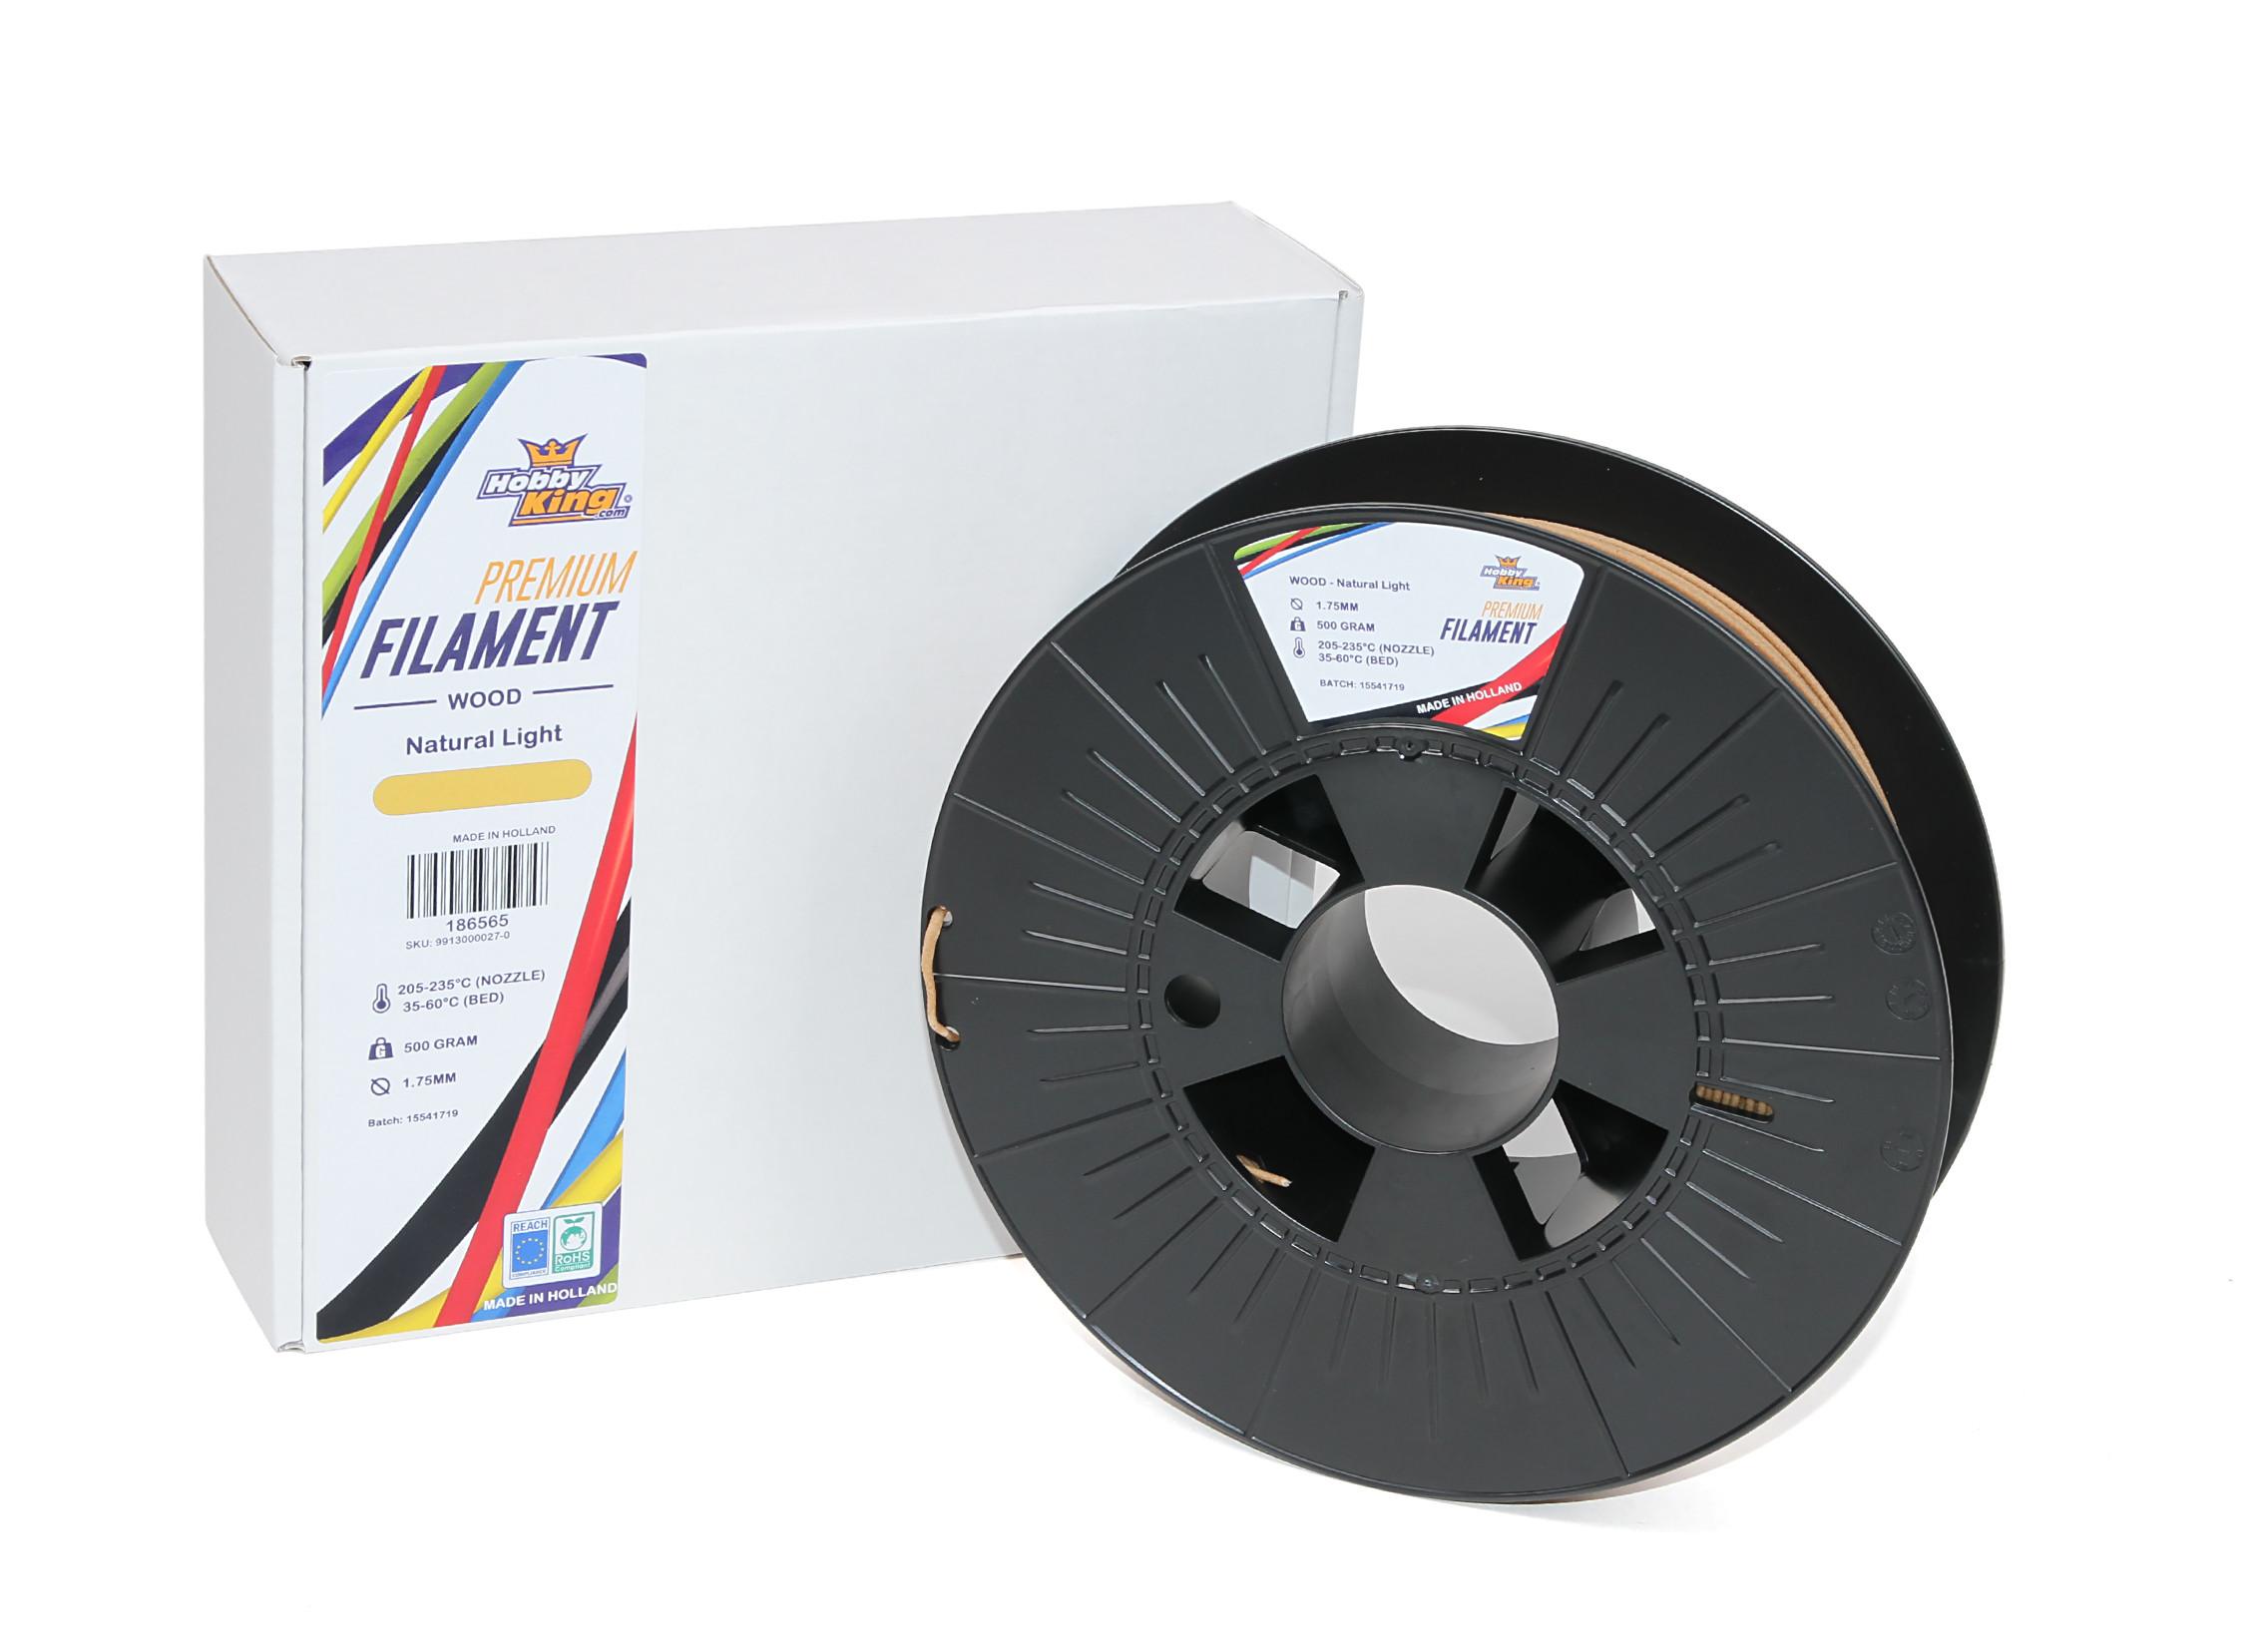 natural Dark Hk Premium 3d Printer Filament 1.75mm Wood 500g Spool Computers/tablets & Networking 3d Printers & Supplies